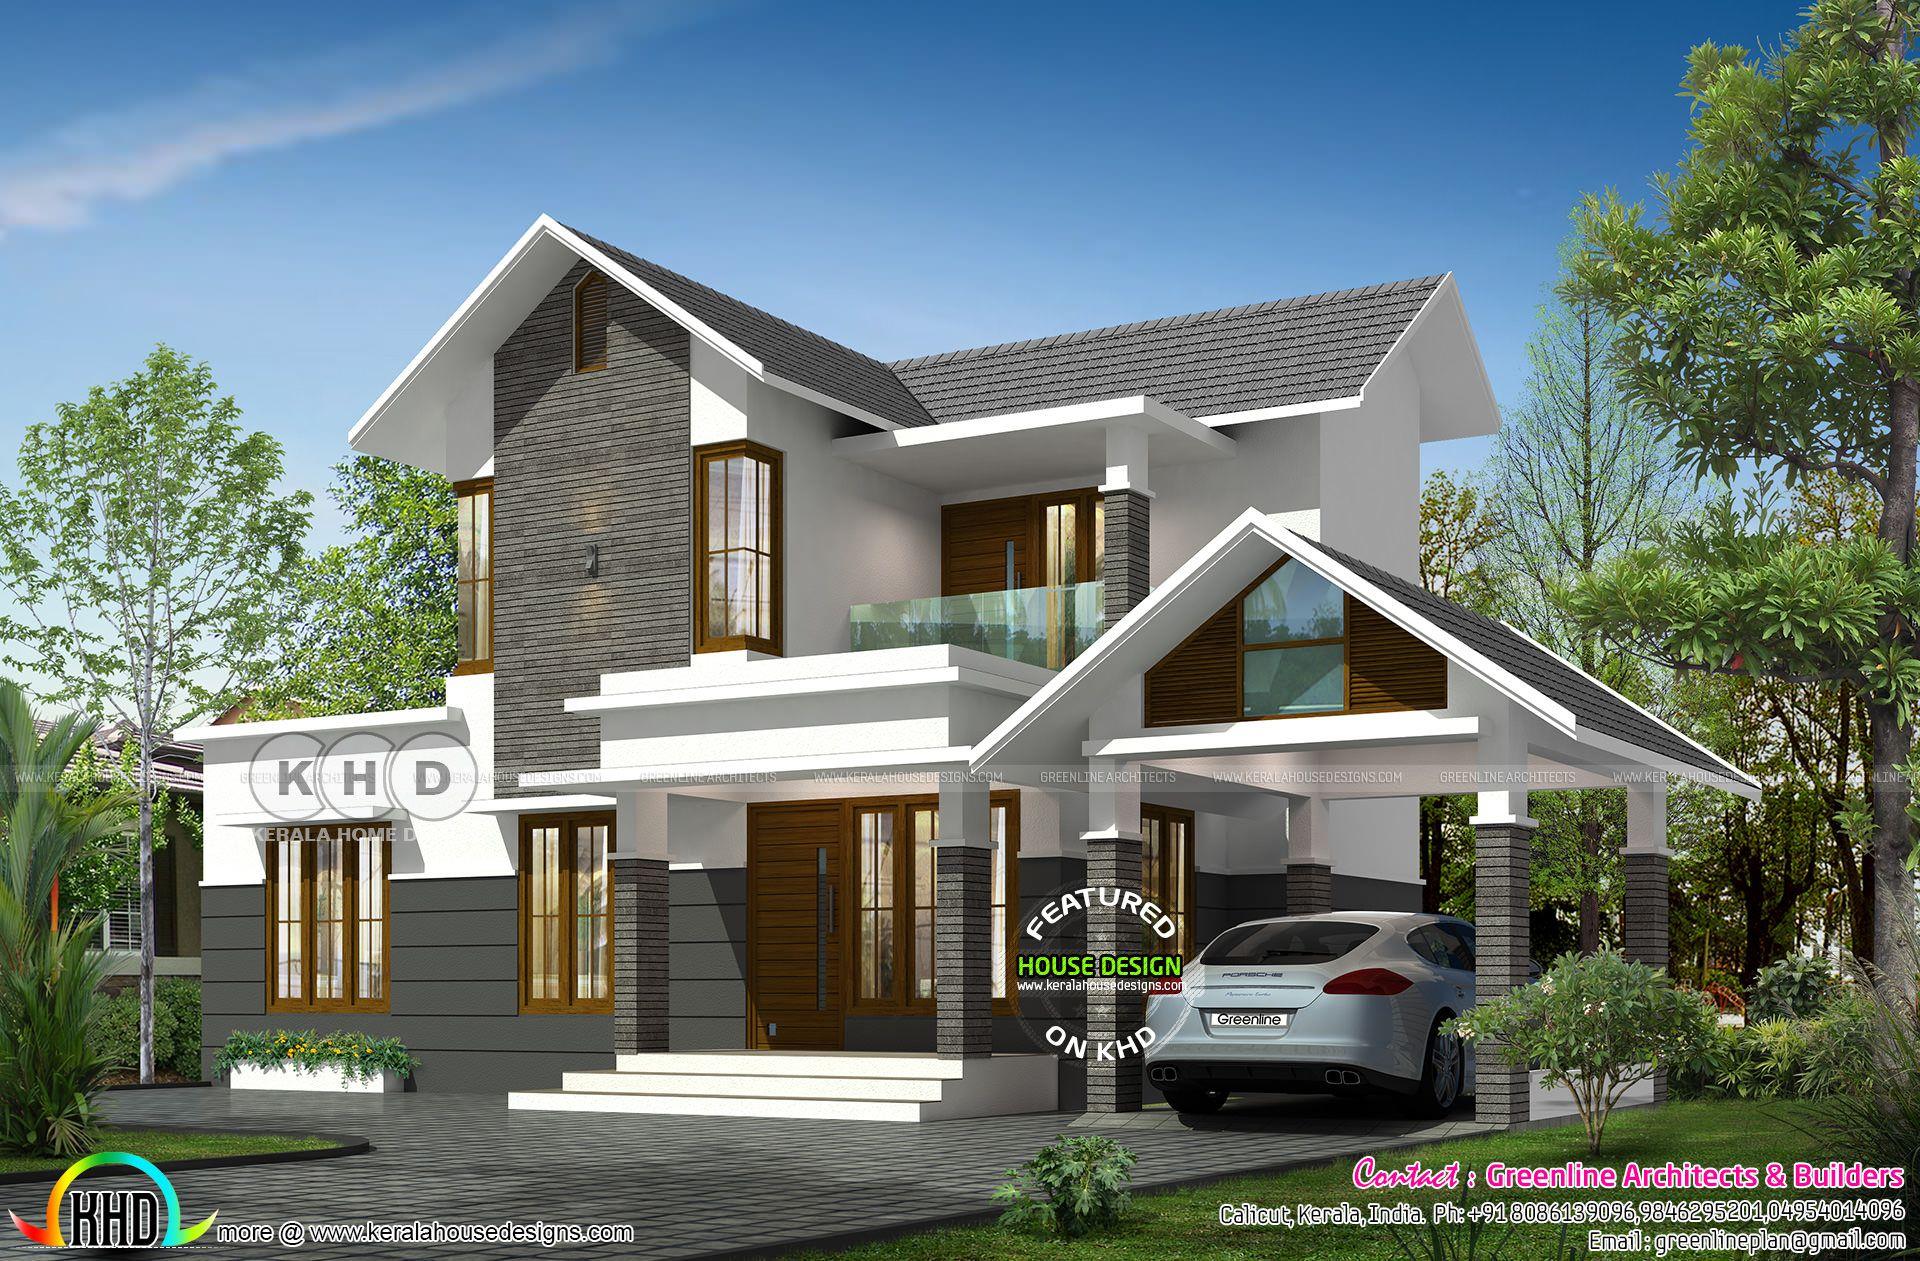 1700 Square Feet 3 Bedroom Modern Sloped Roof Home Bungalow House Design Kerala House Design Modern House Exterior